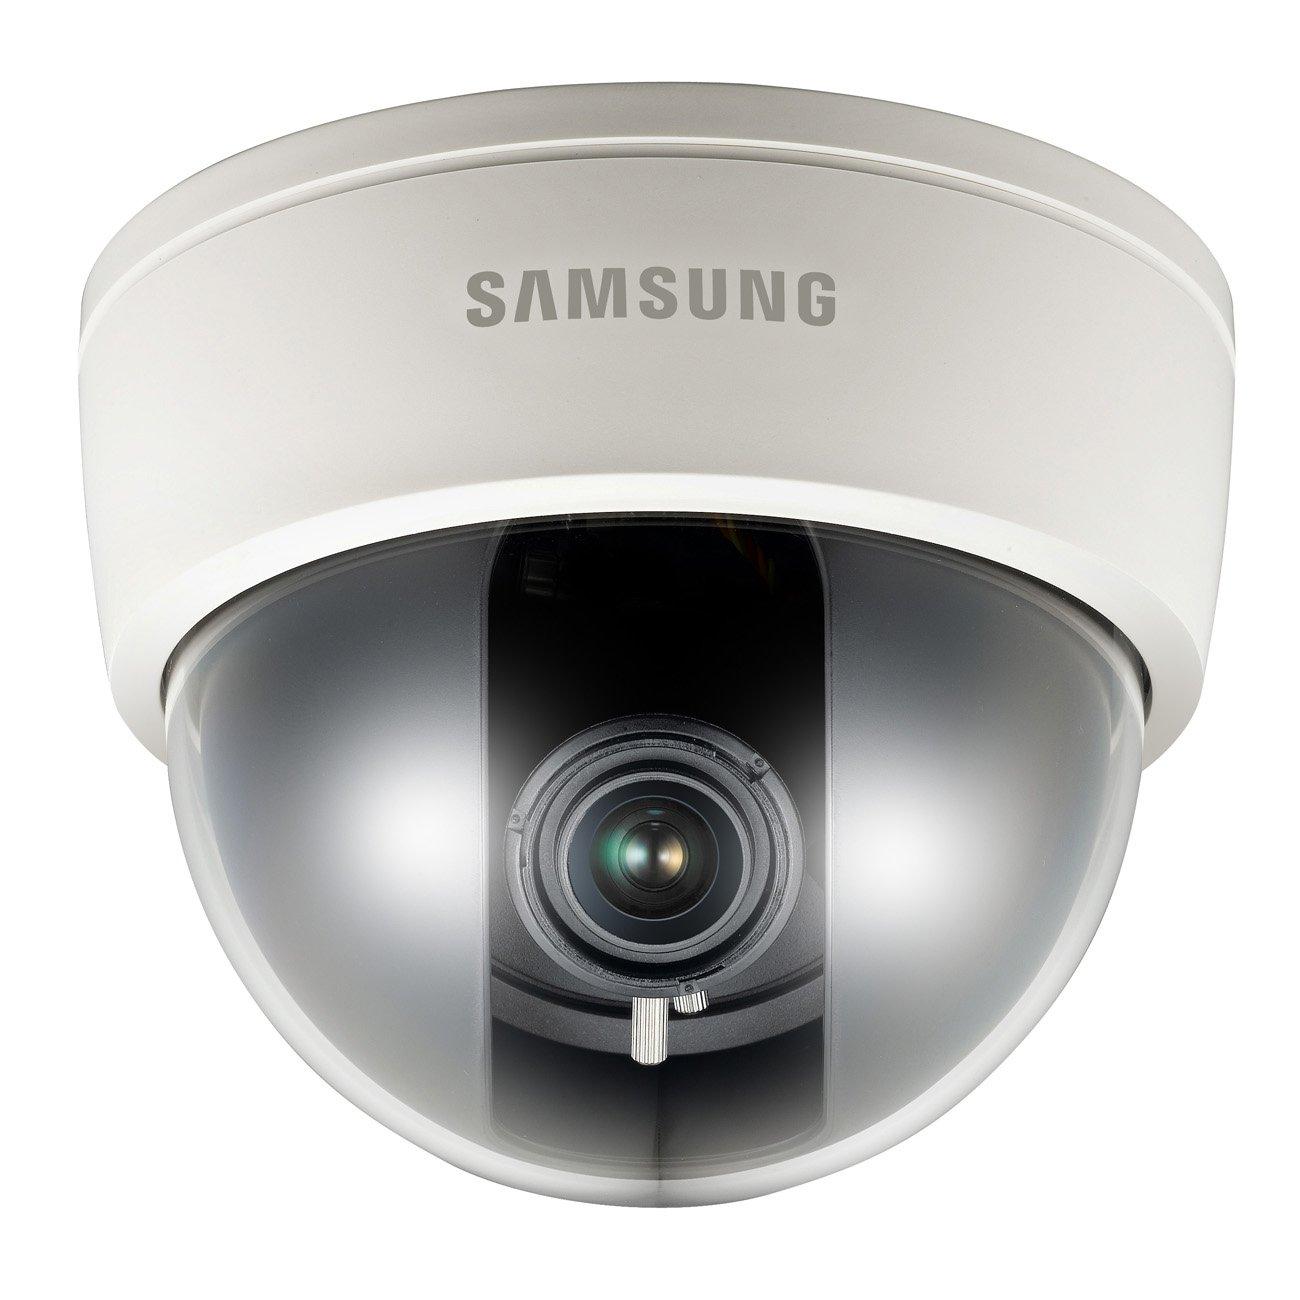 Amazon Com Samsung Scd 2080 High Resolution Dome Camera With 2 8